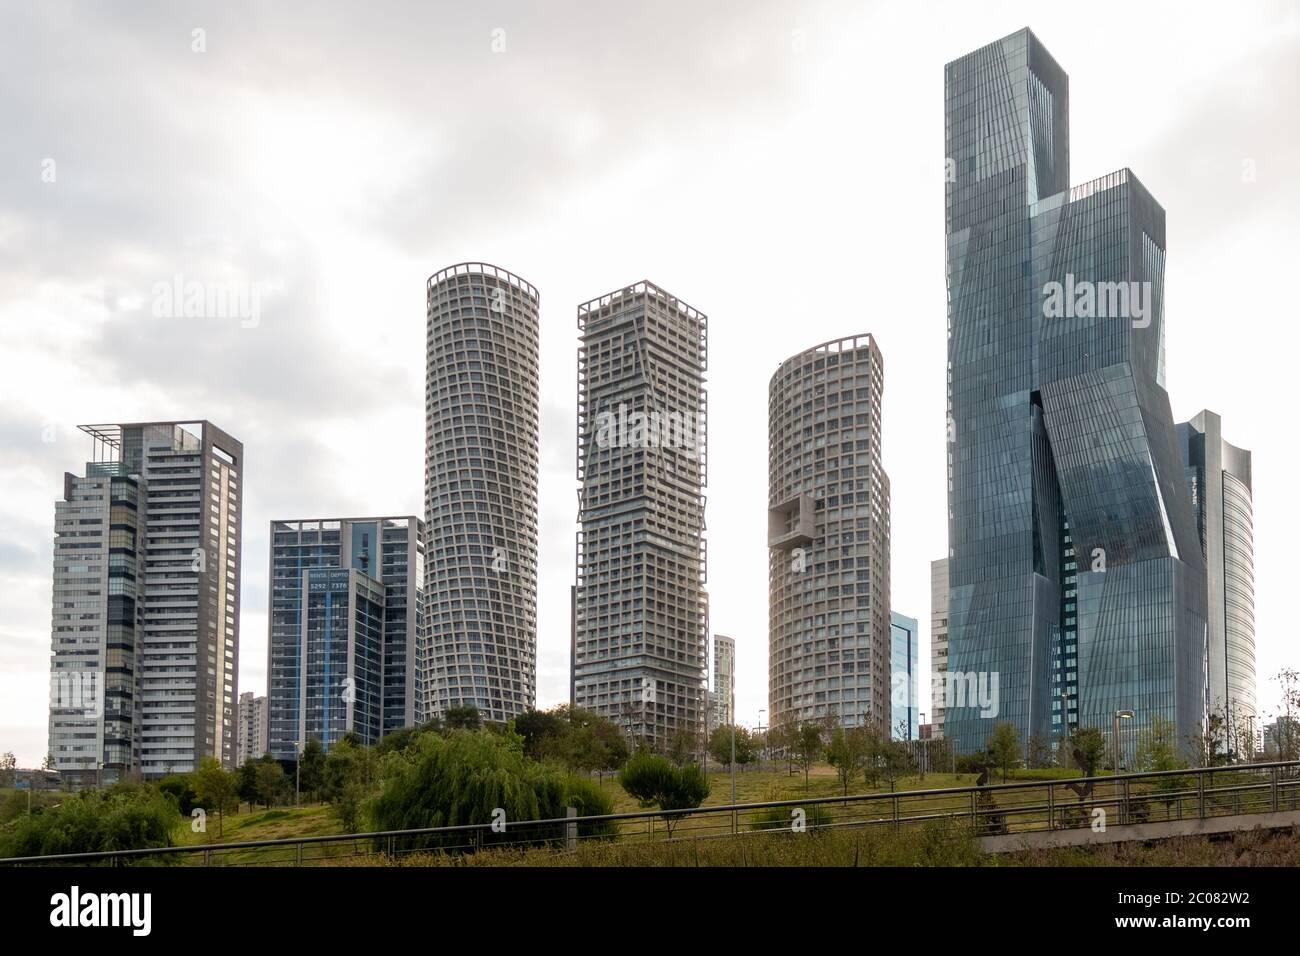 La Mexicana Santa Fe Mexico City June 9 2020 Office And Apartment Buildings In Mexico City Stock Photo Alamy